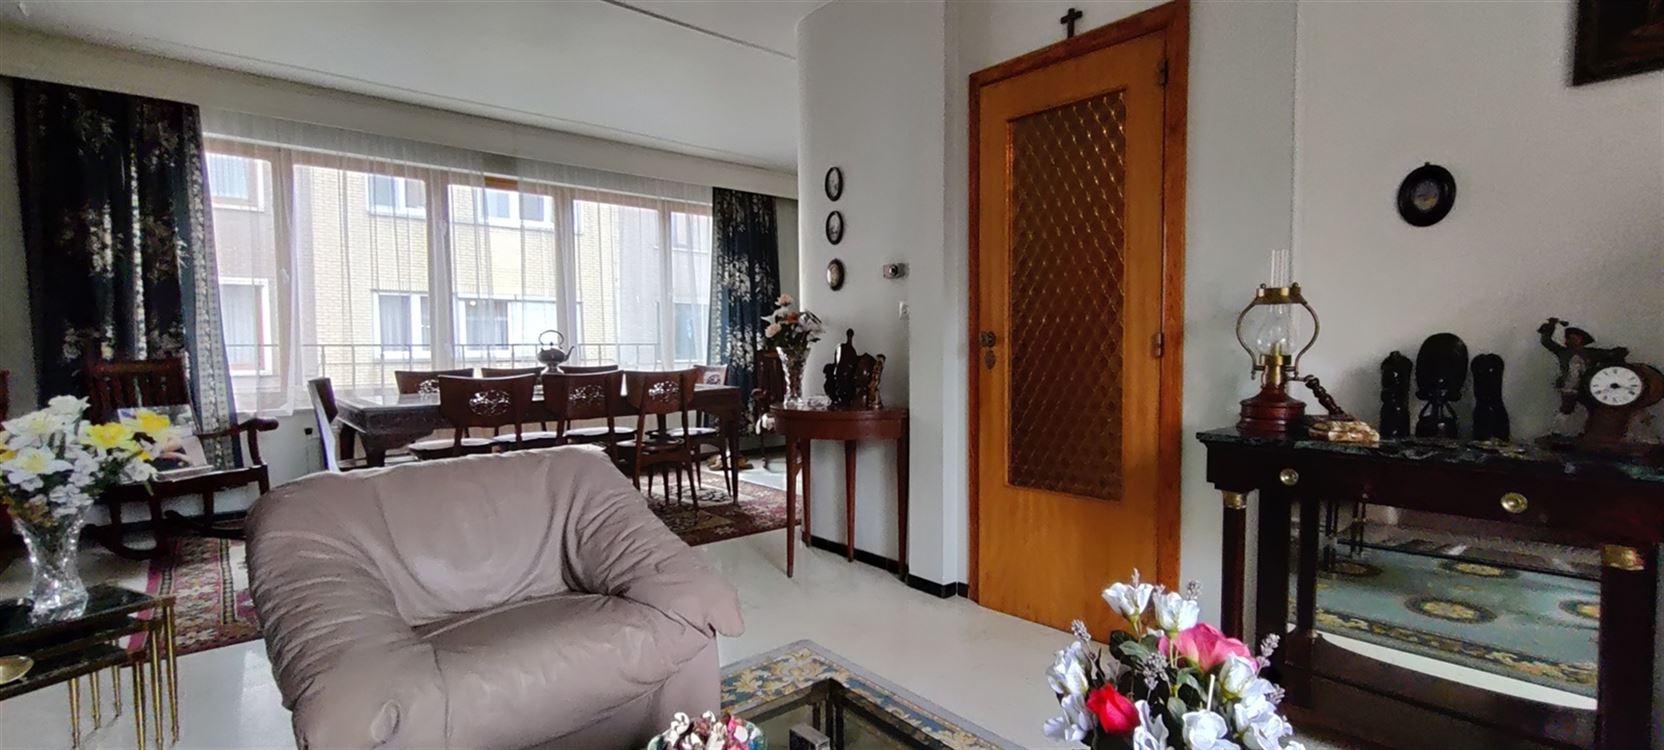 Foto 3 : Huis te 1420 BRAINE-L'ALLEUD (België) - Prijs € 335.000